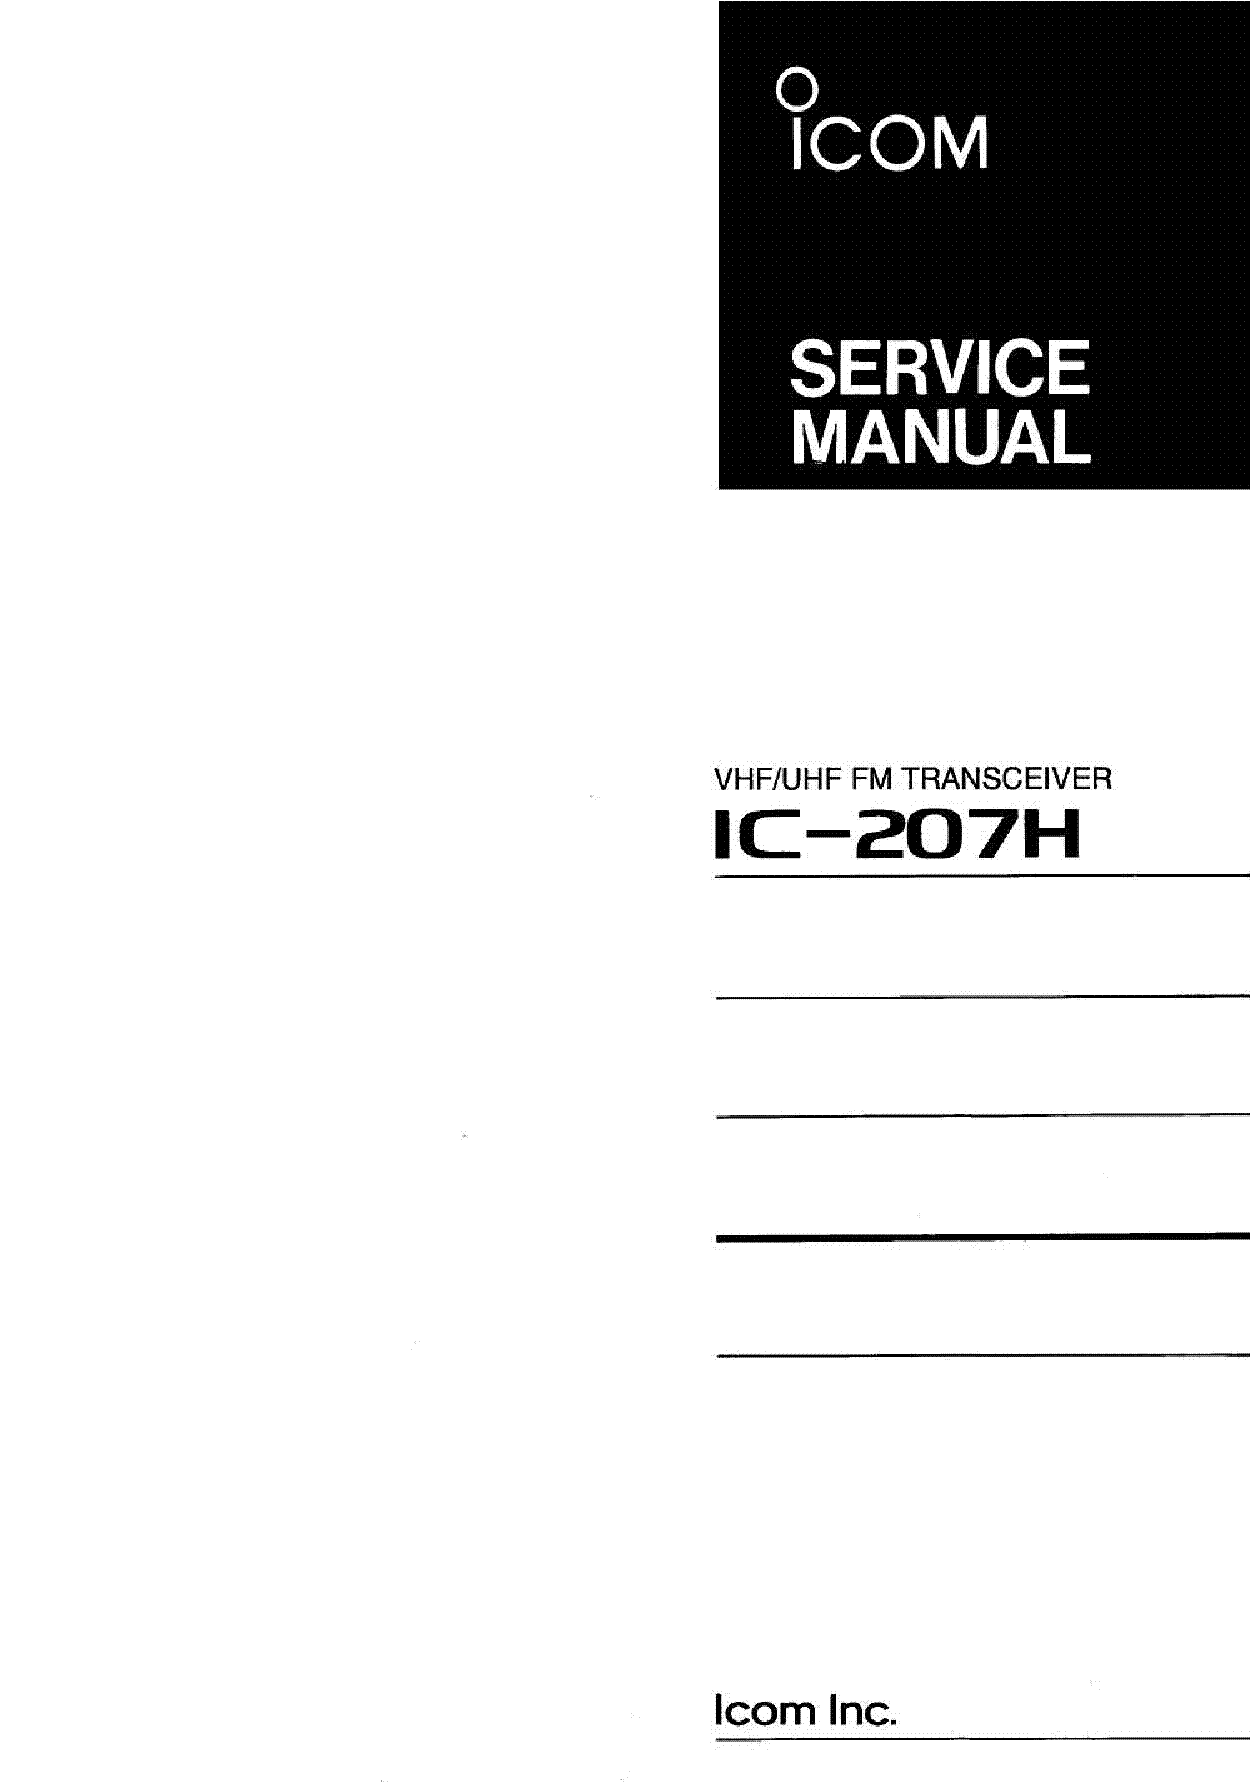 ICOM IC-207H SERVICE MANUAL service manual (1st page)